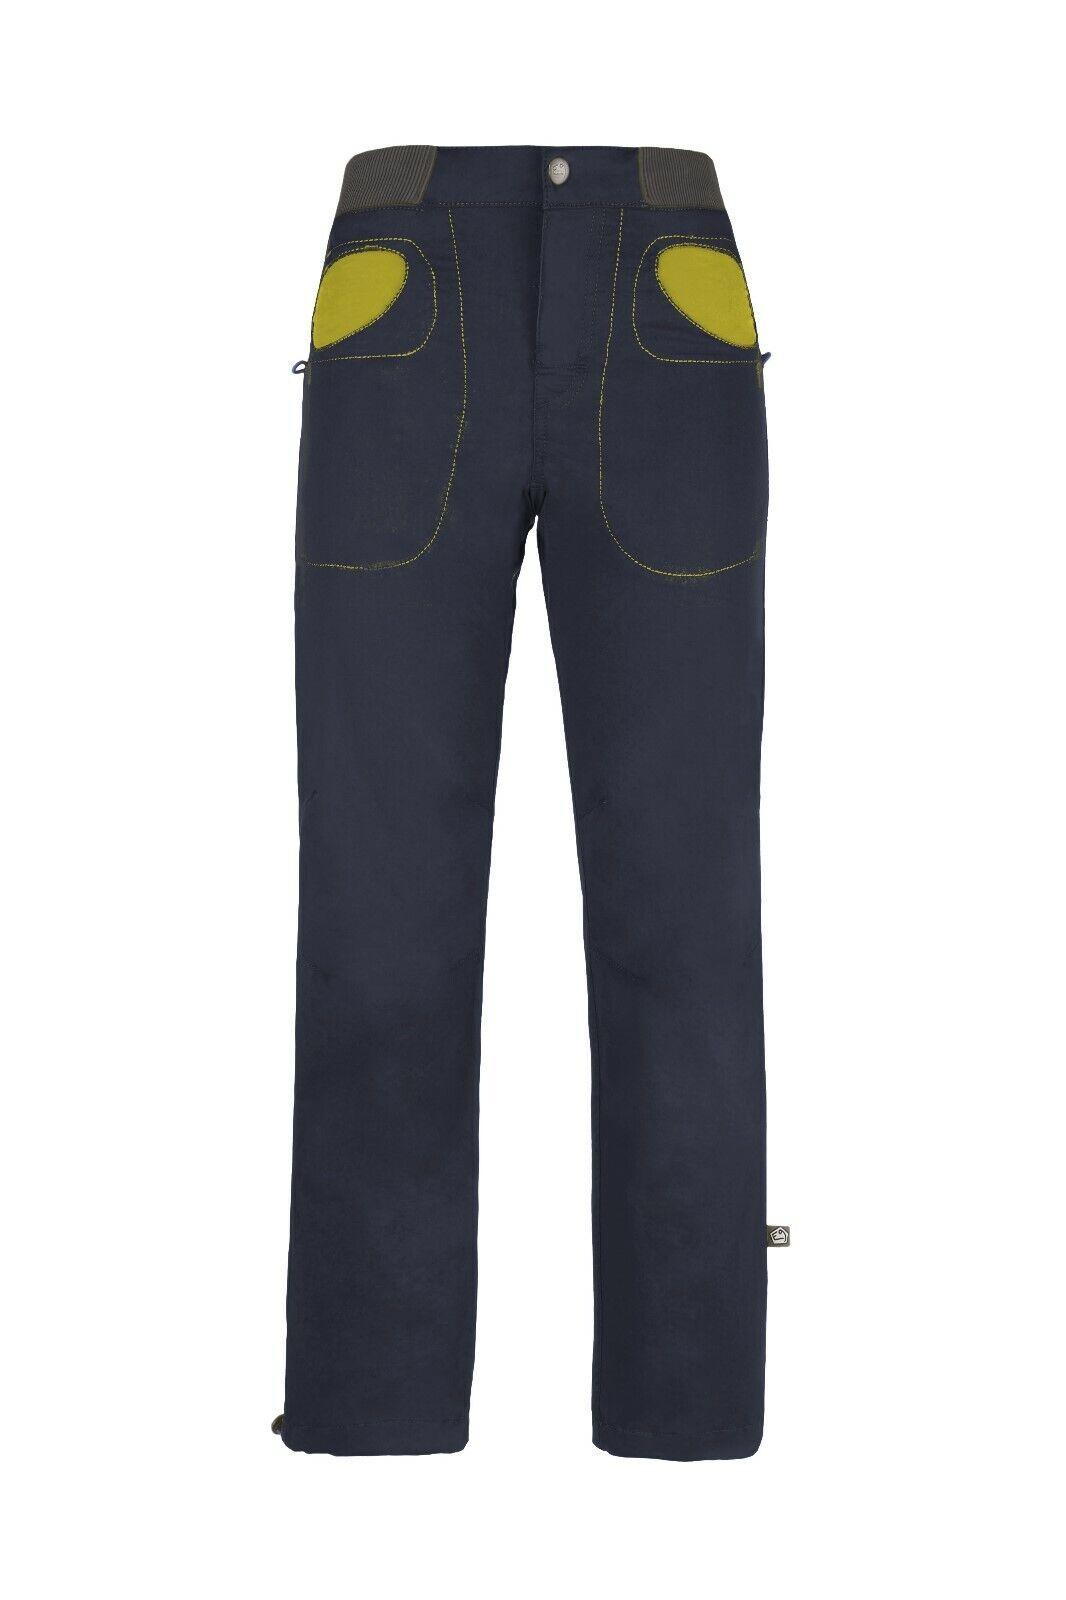 E9 B Rondo Storia Pantalone per Bambini Arrampicata Boulderhose blunavy